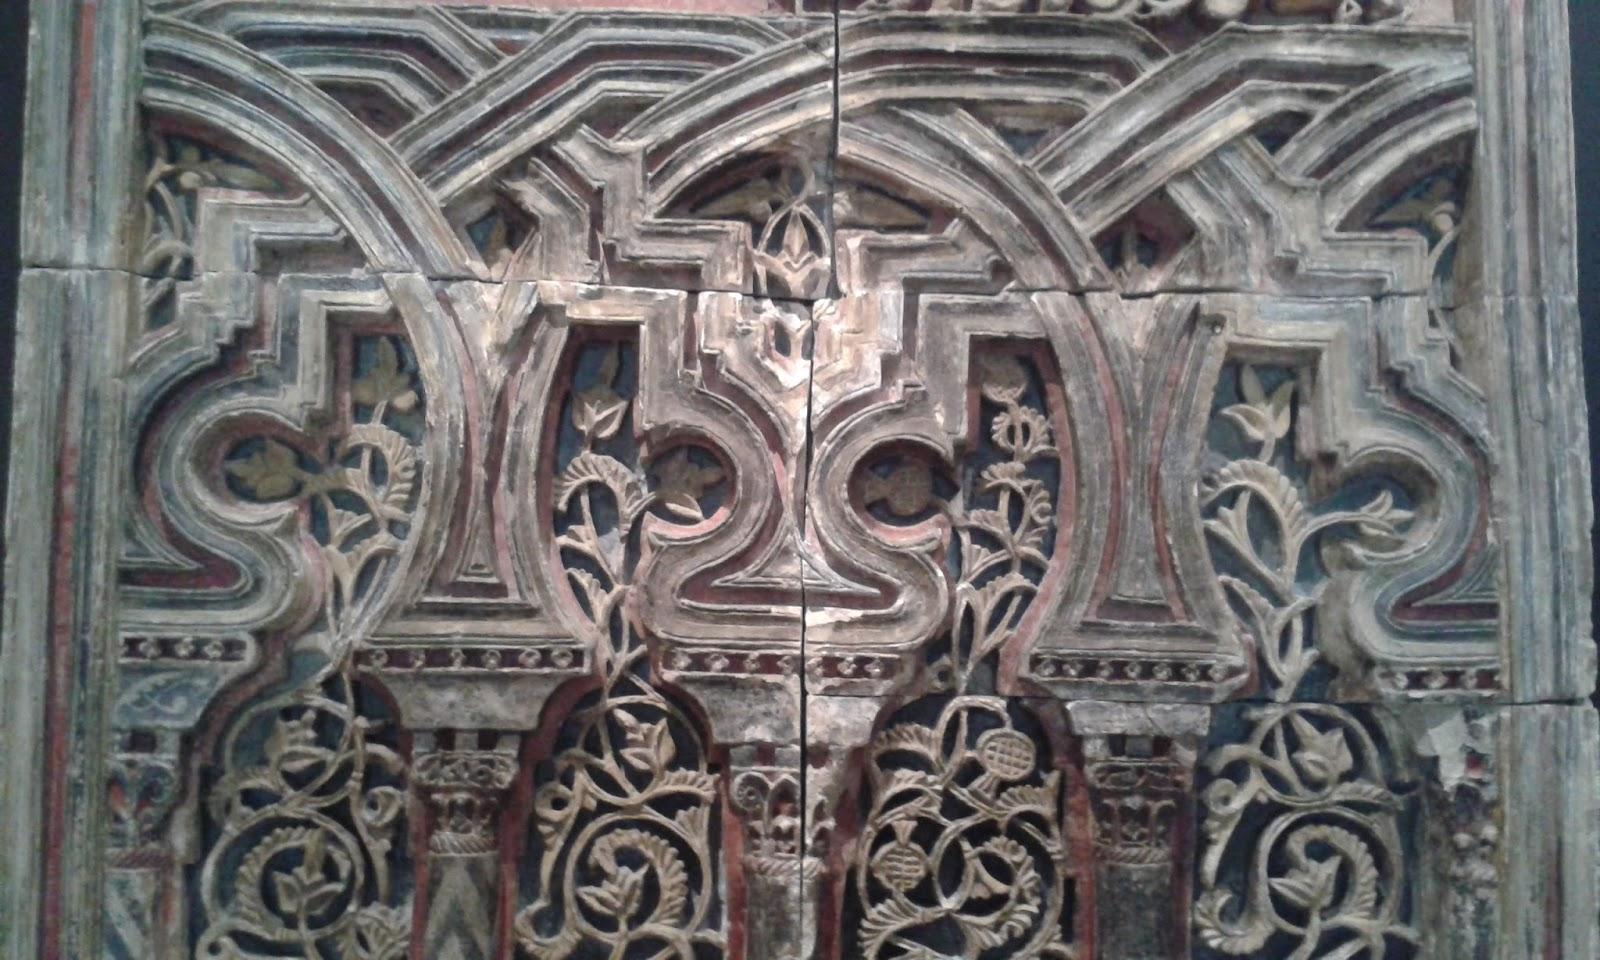 Madrid con encanto museo arqueol gico nacional en madrid - Medina azahara decoracion ...